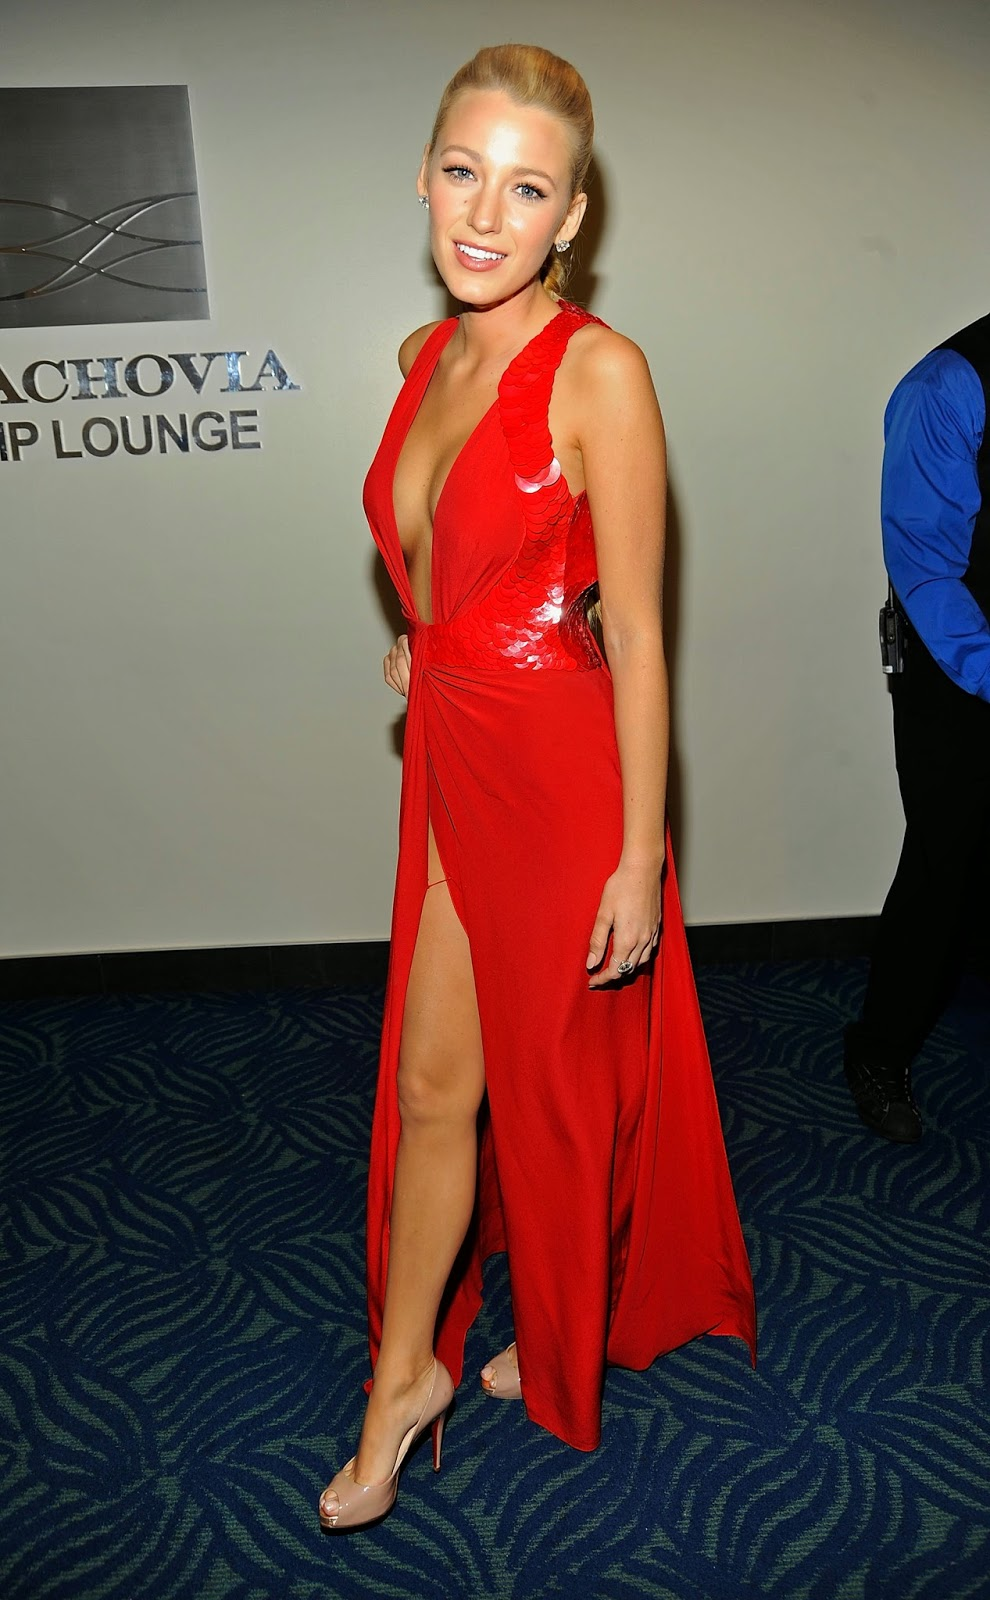 Blake Lively Red Dress Cocktail Dresses 2016